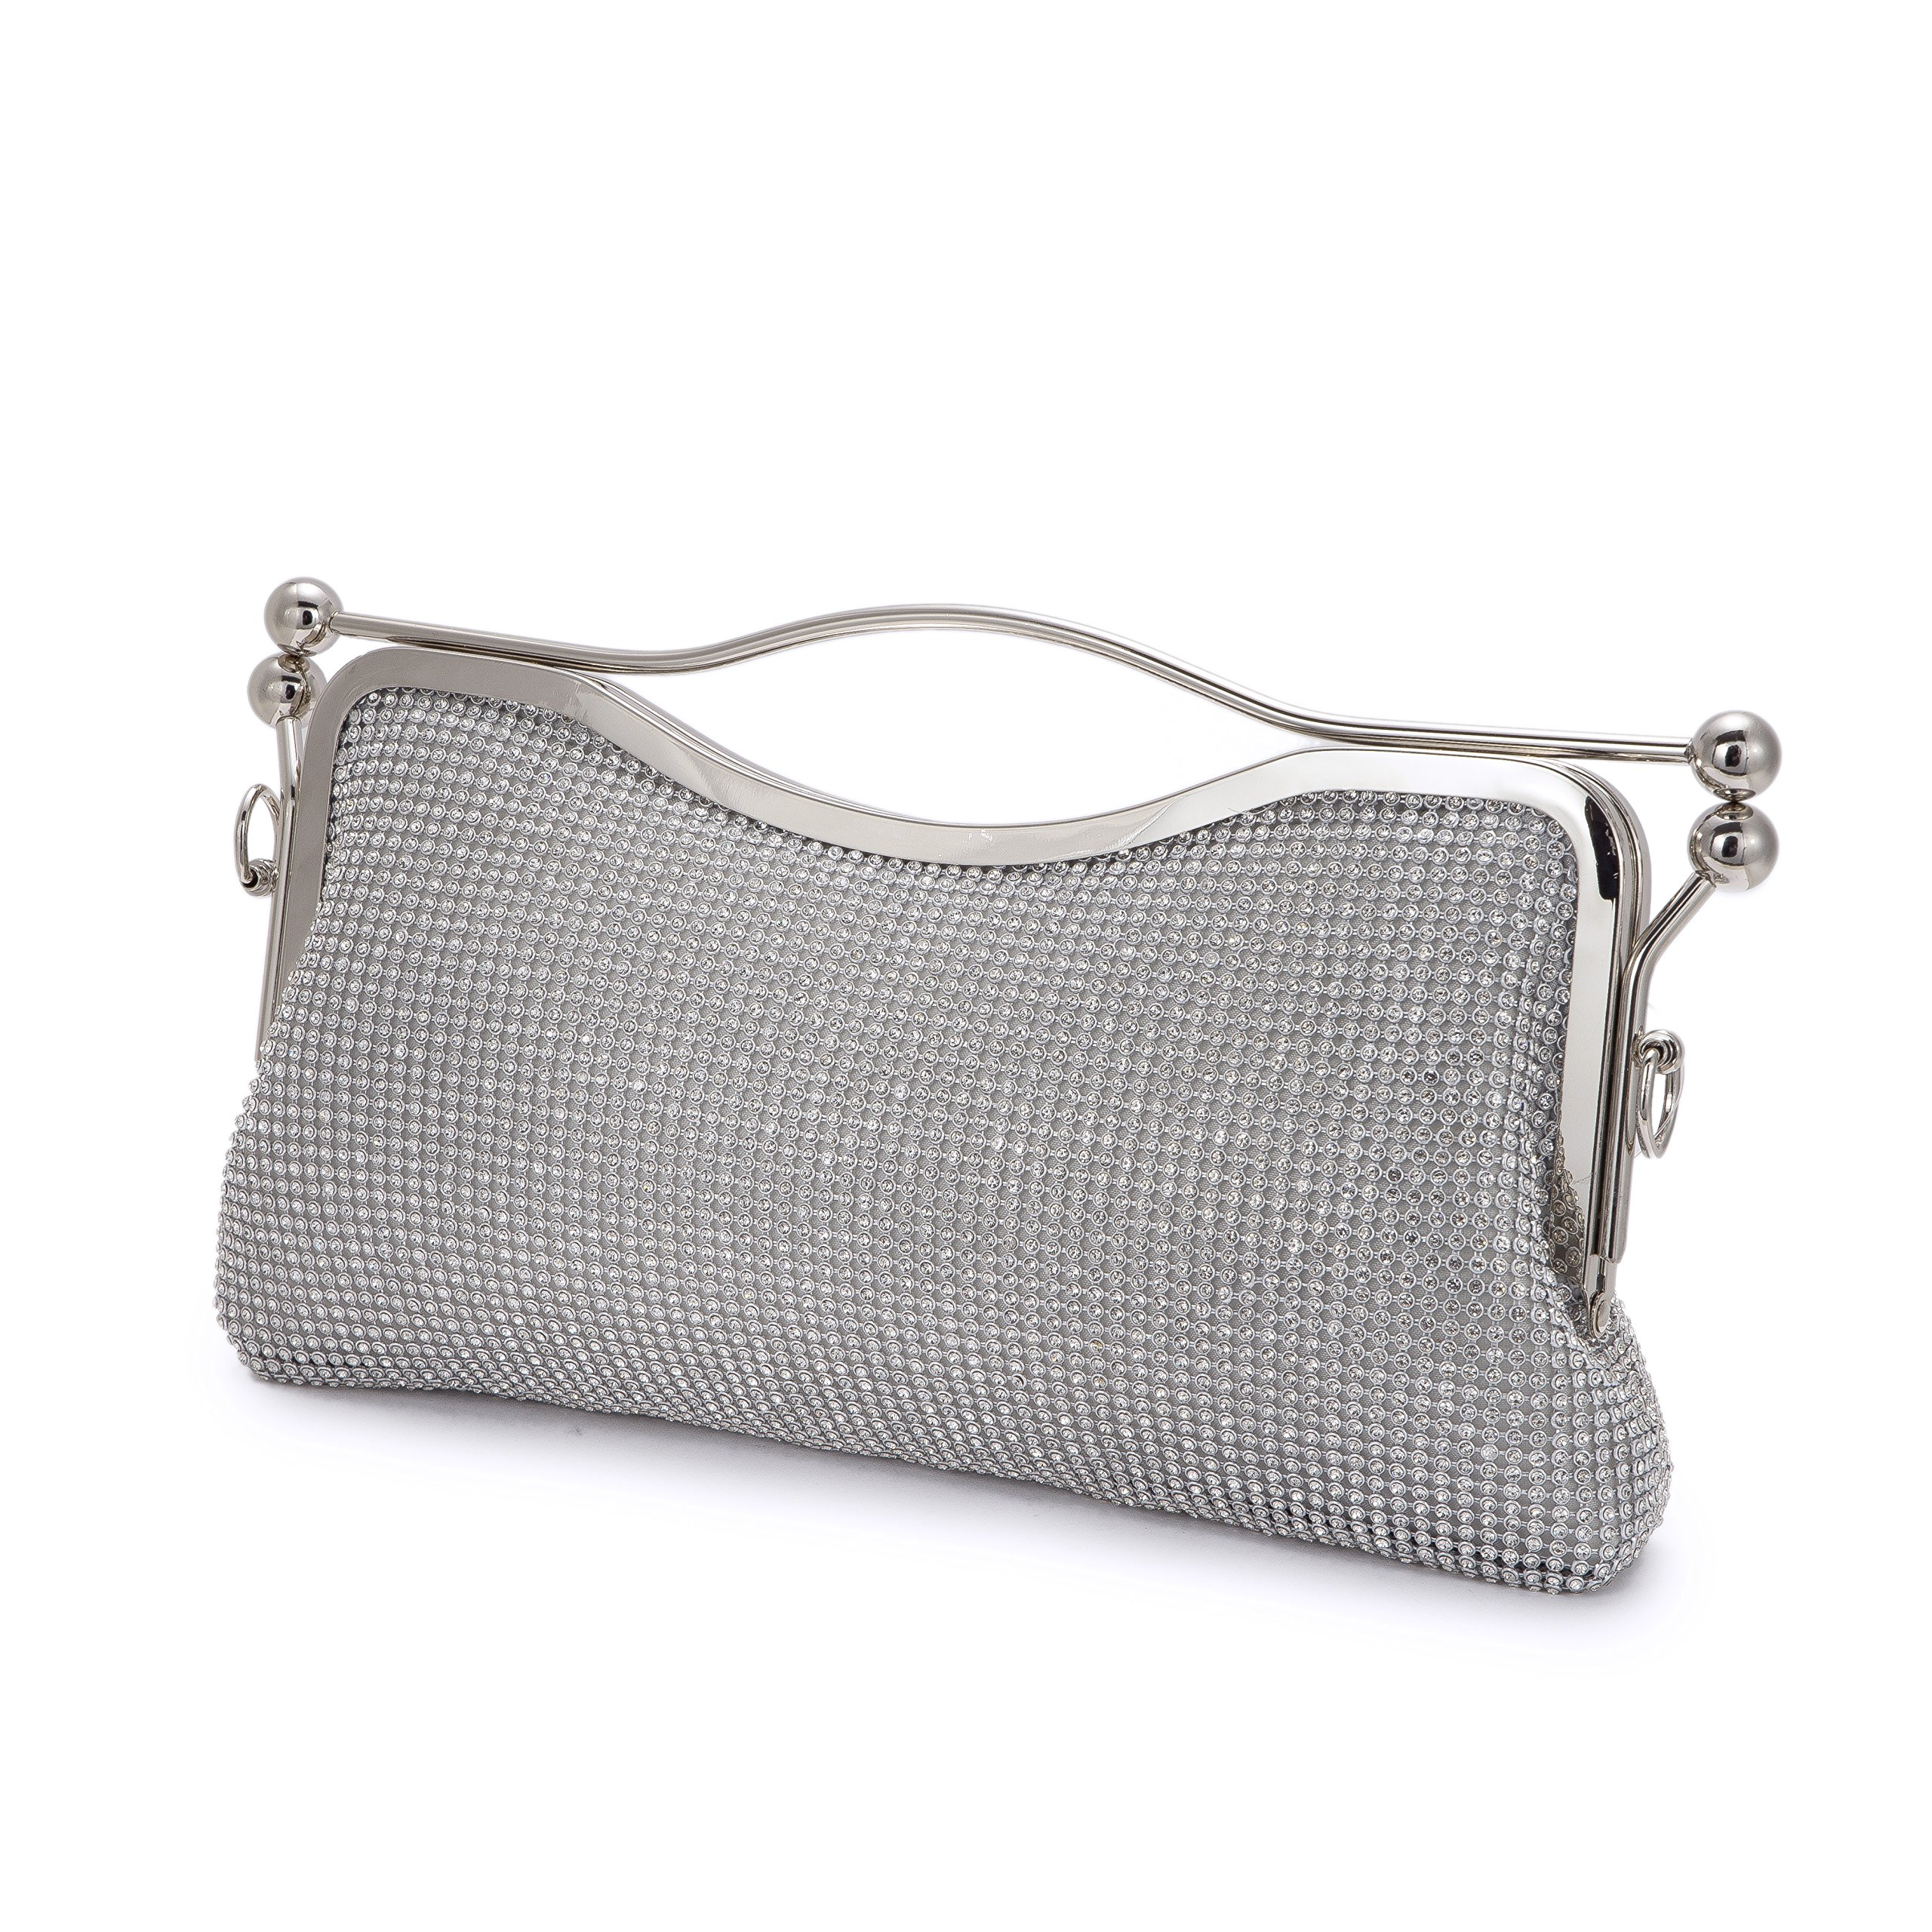 Xindi Evening Bags Silver Clutches for Women Handbags Messenger Bags Rhinestone Bags Women Large Capacity Shoulder Bag